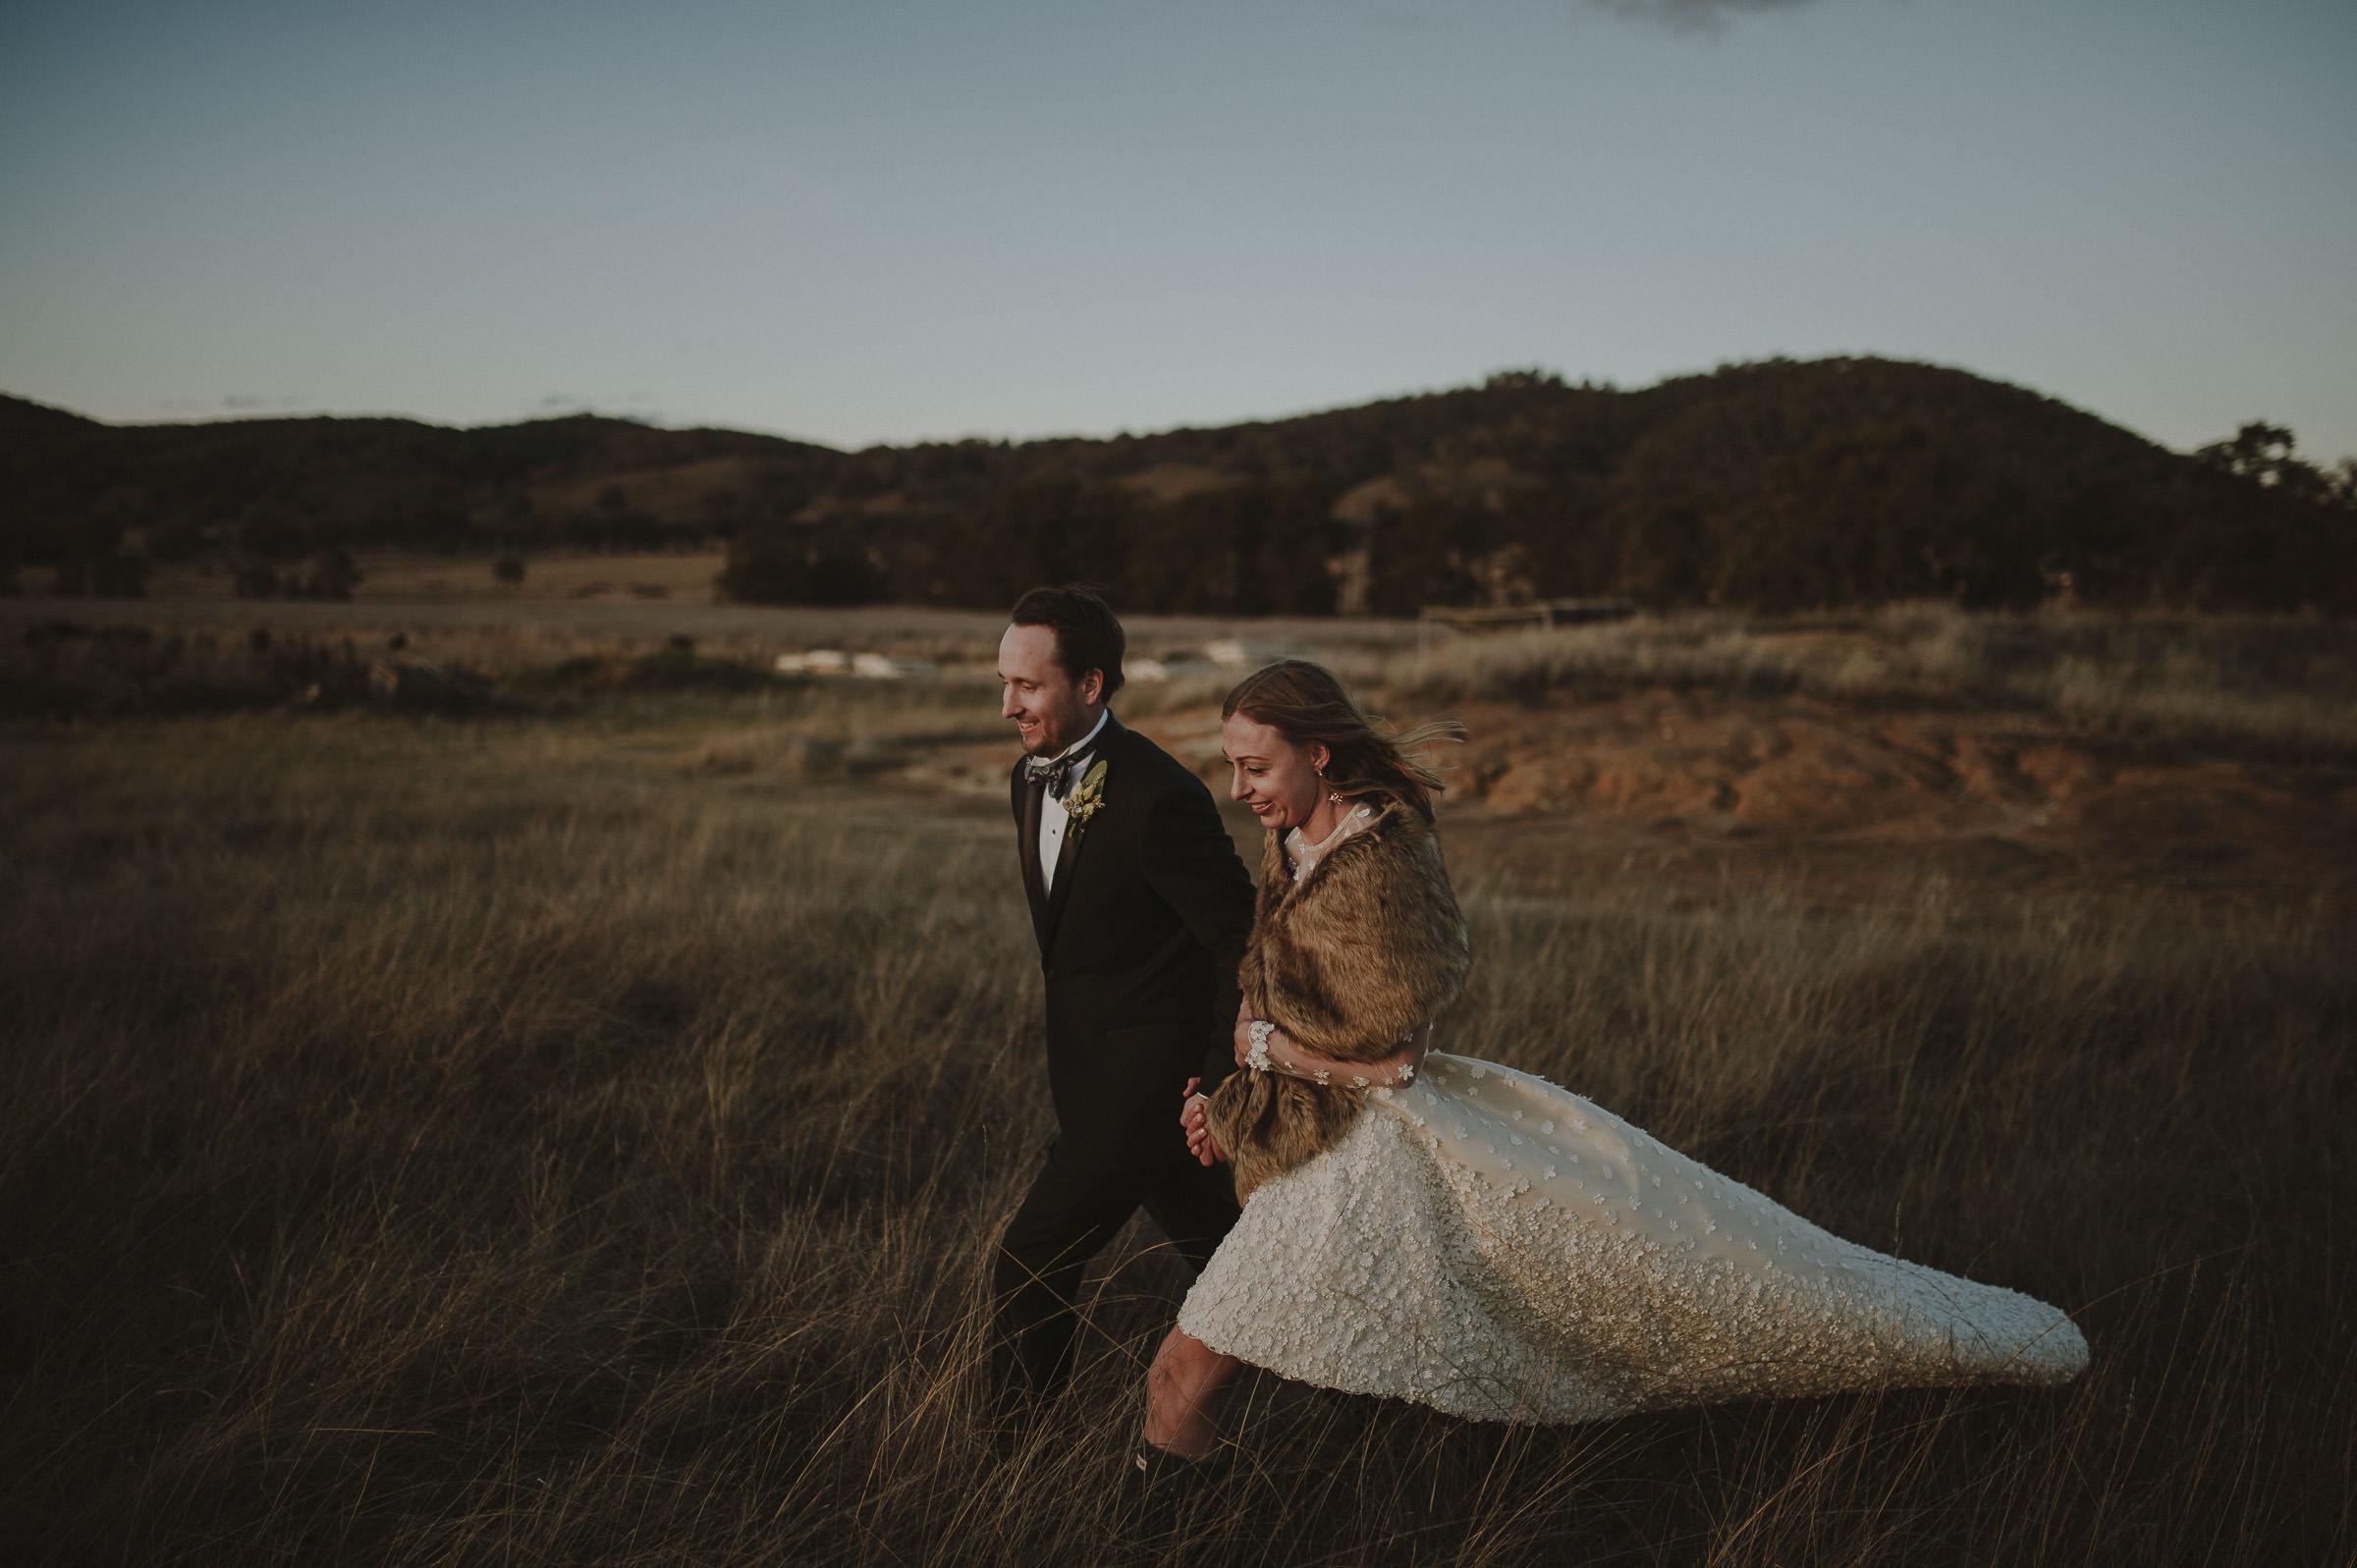 Emily_Skewesy_Mudgee_Wedding_Blog-35.jpg